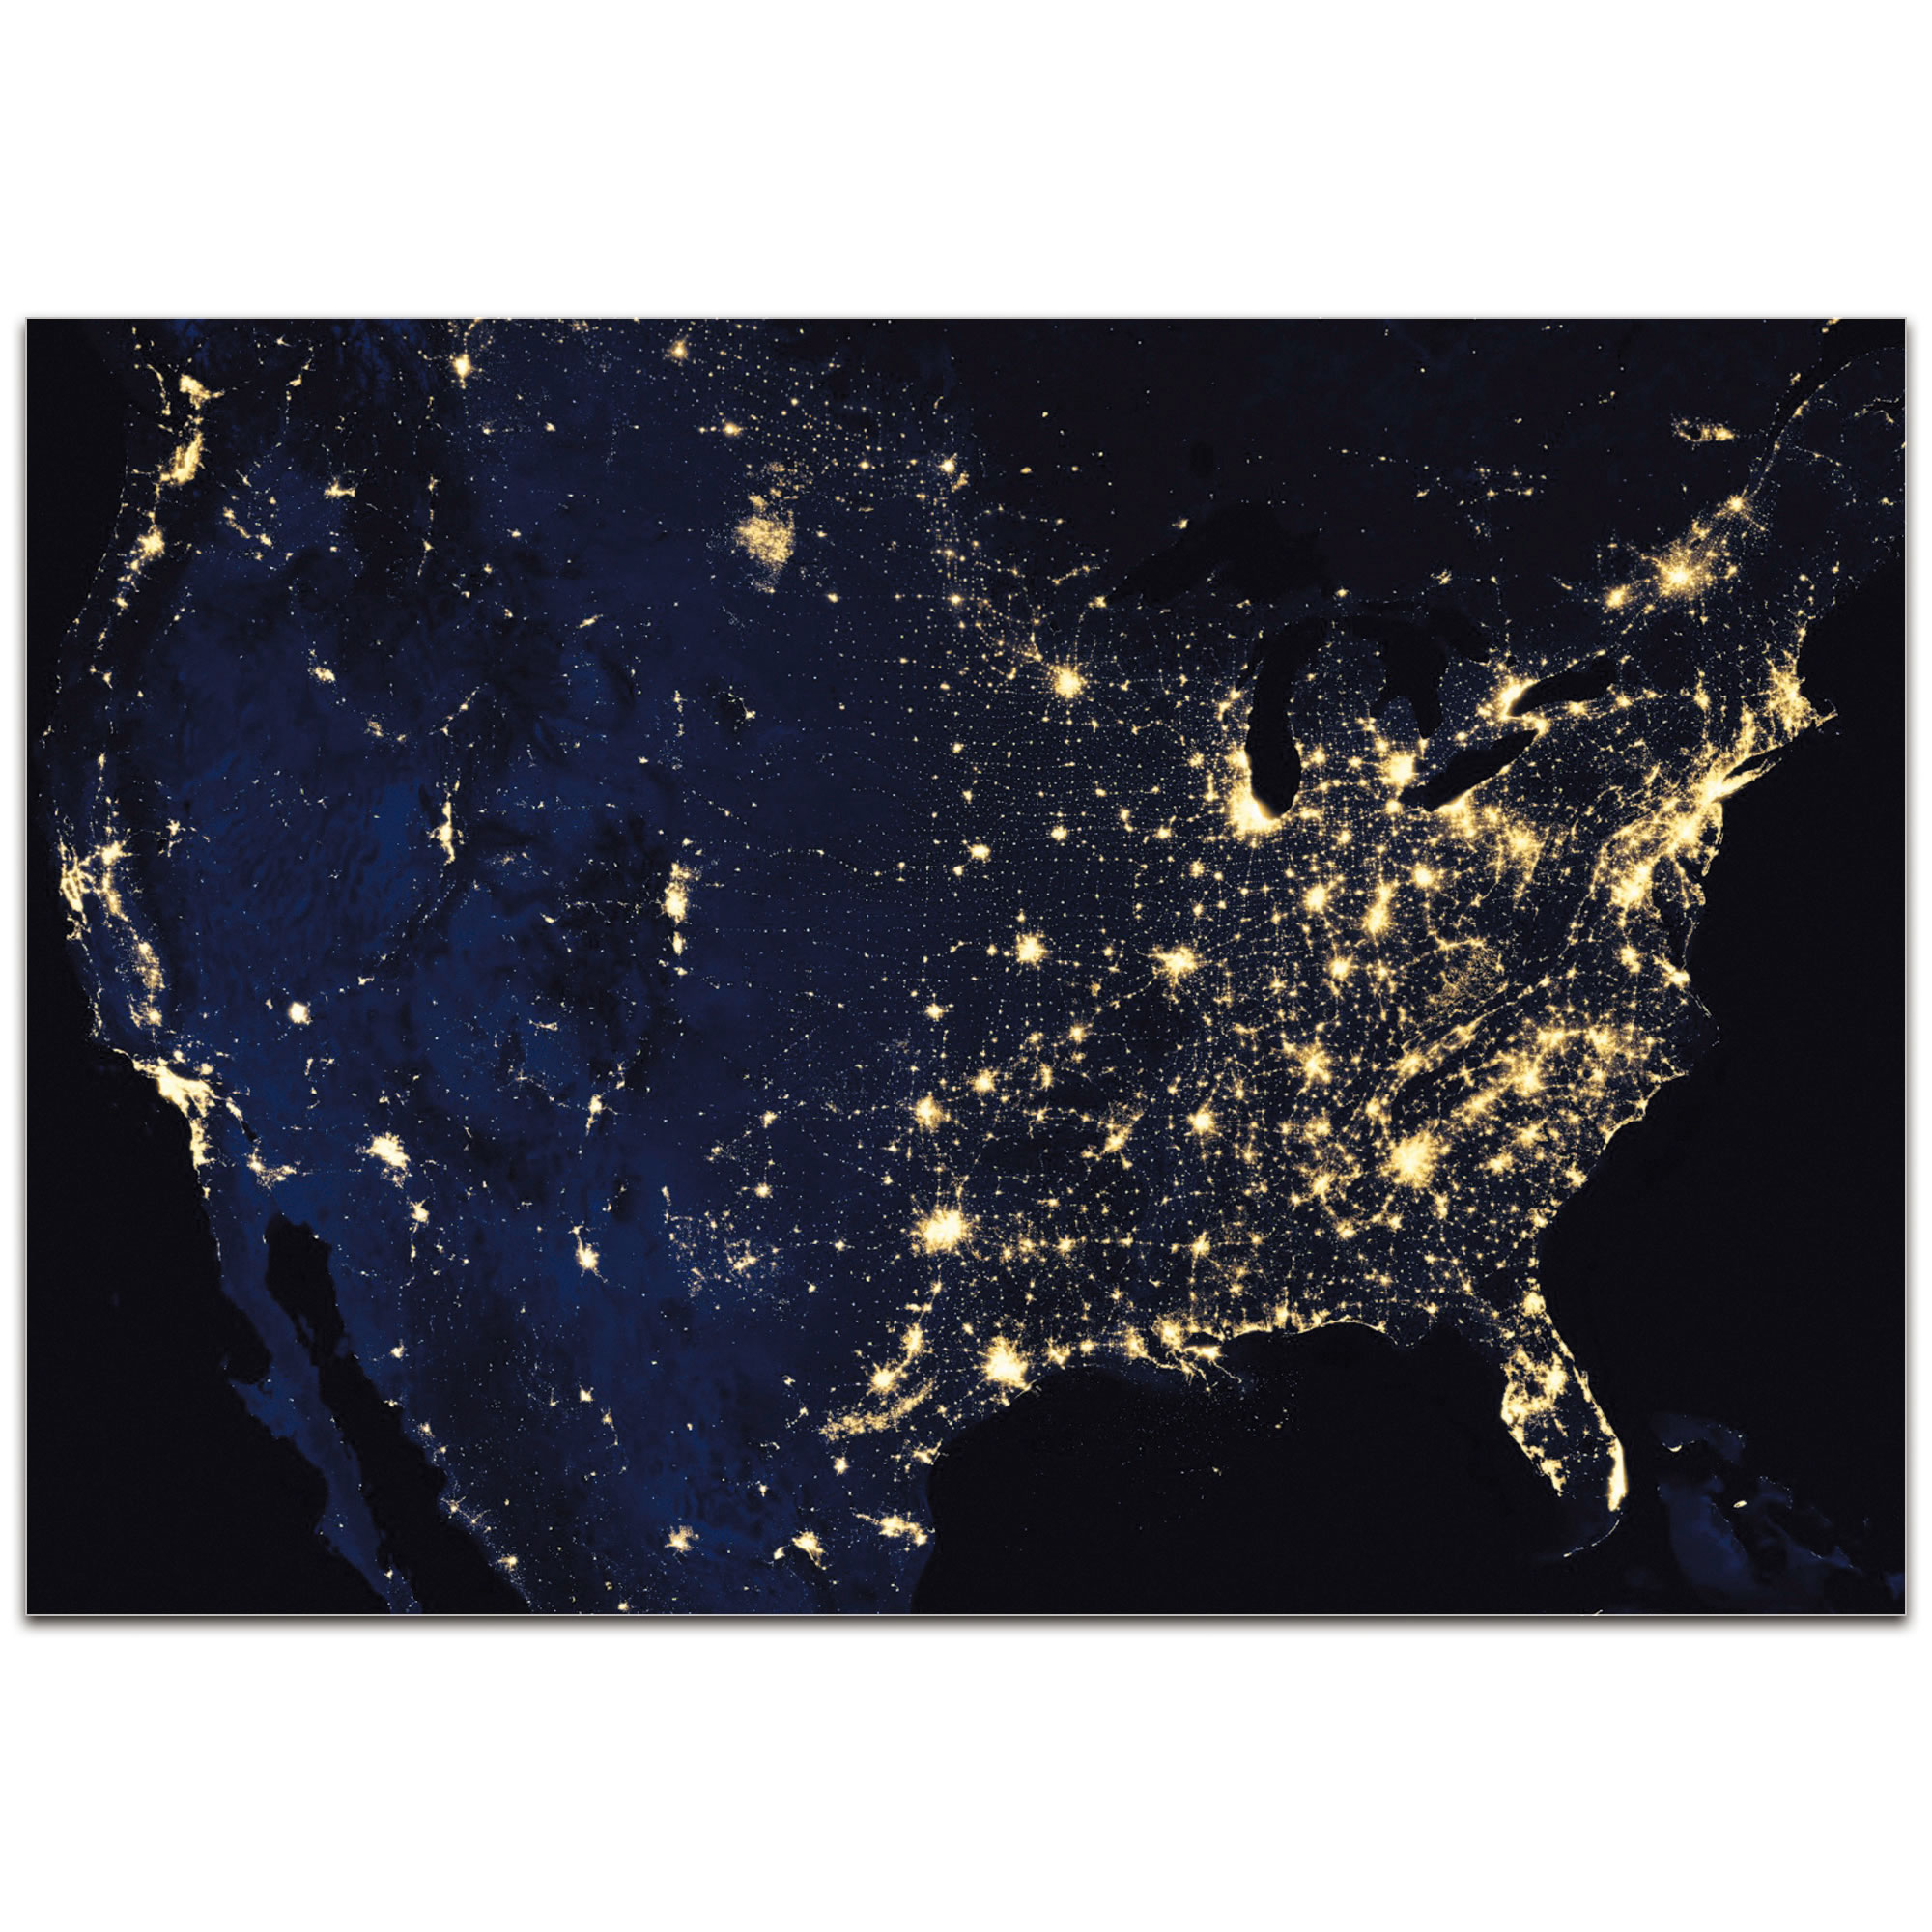 USA at Night - Modern Wall Decor